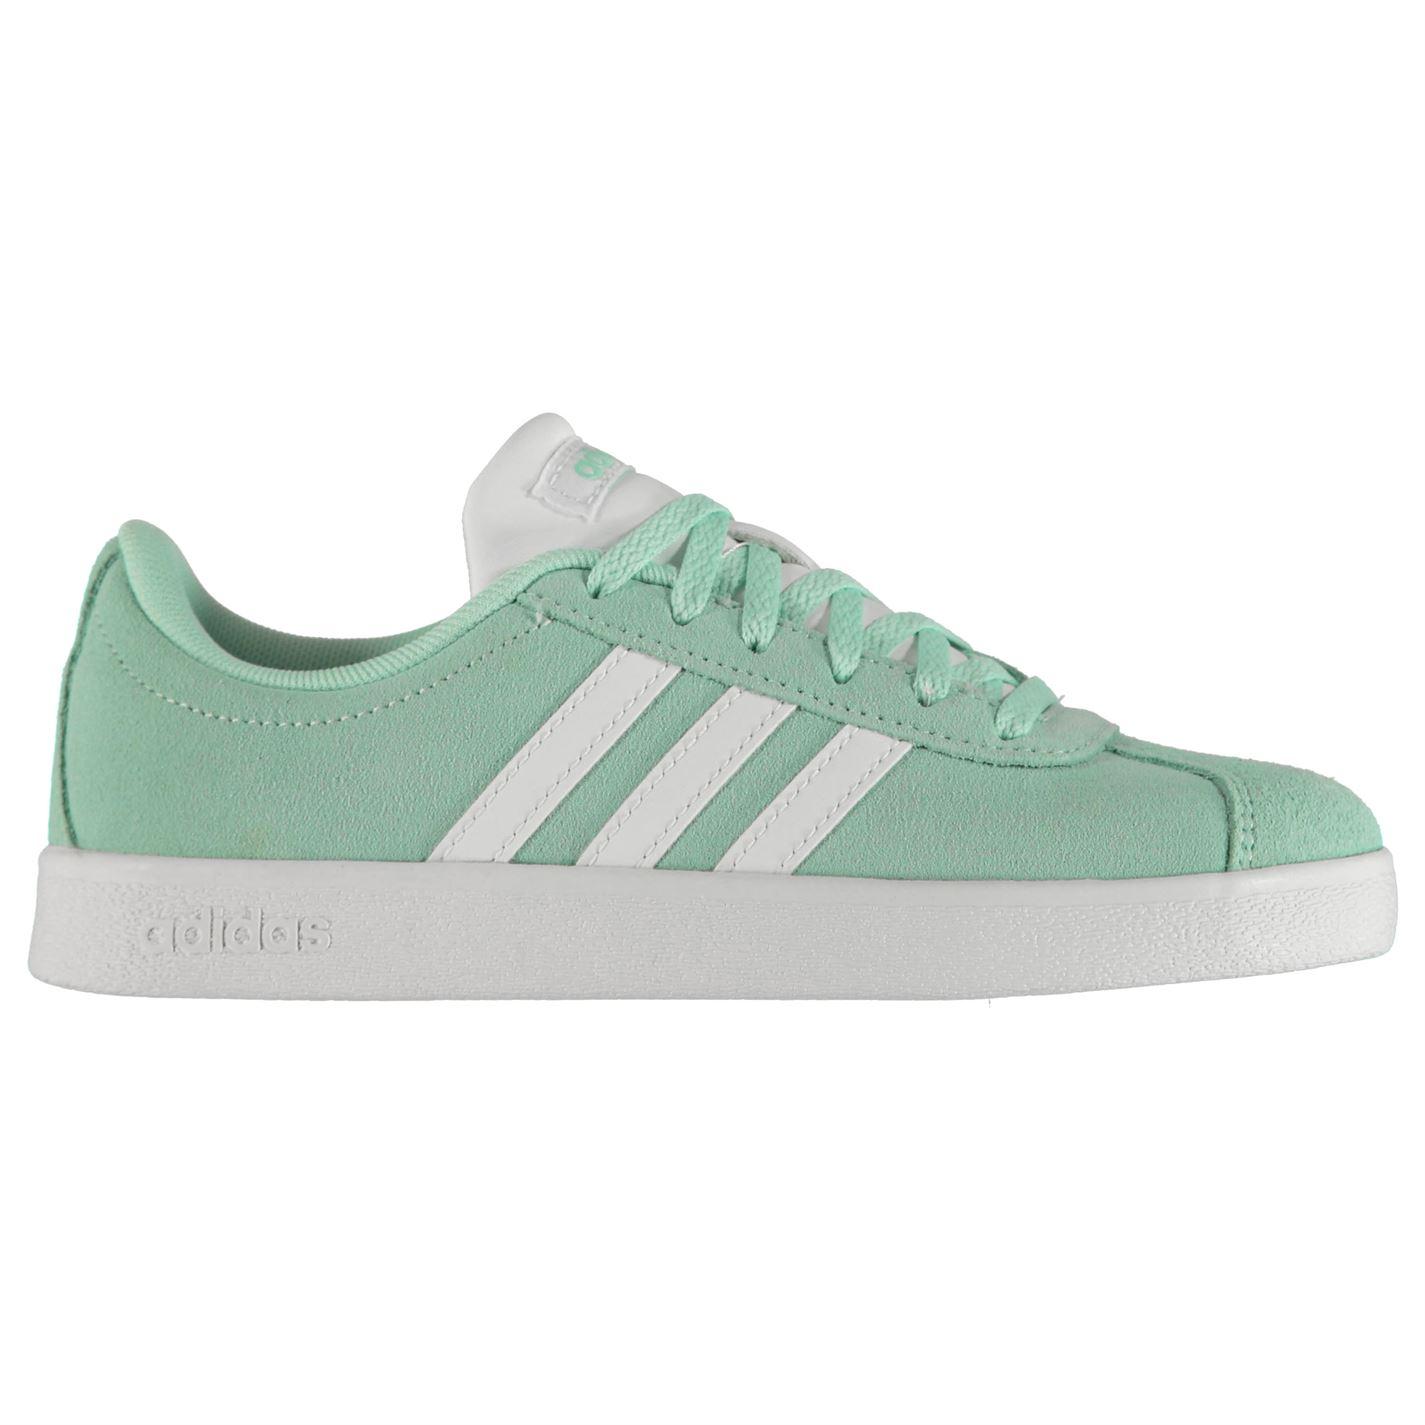 Adidas VL Court Suede Shoes Child Girls